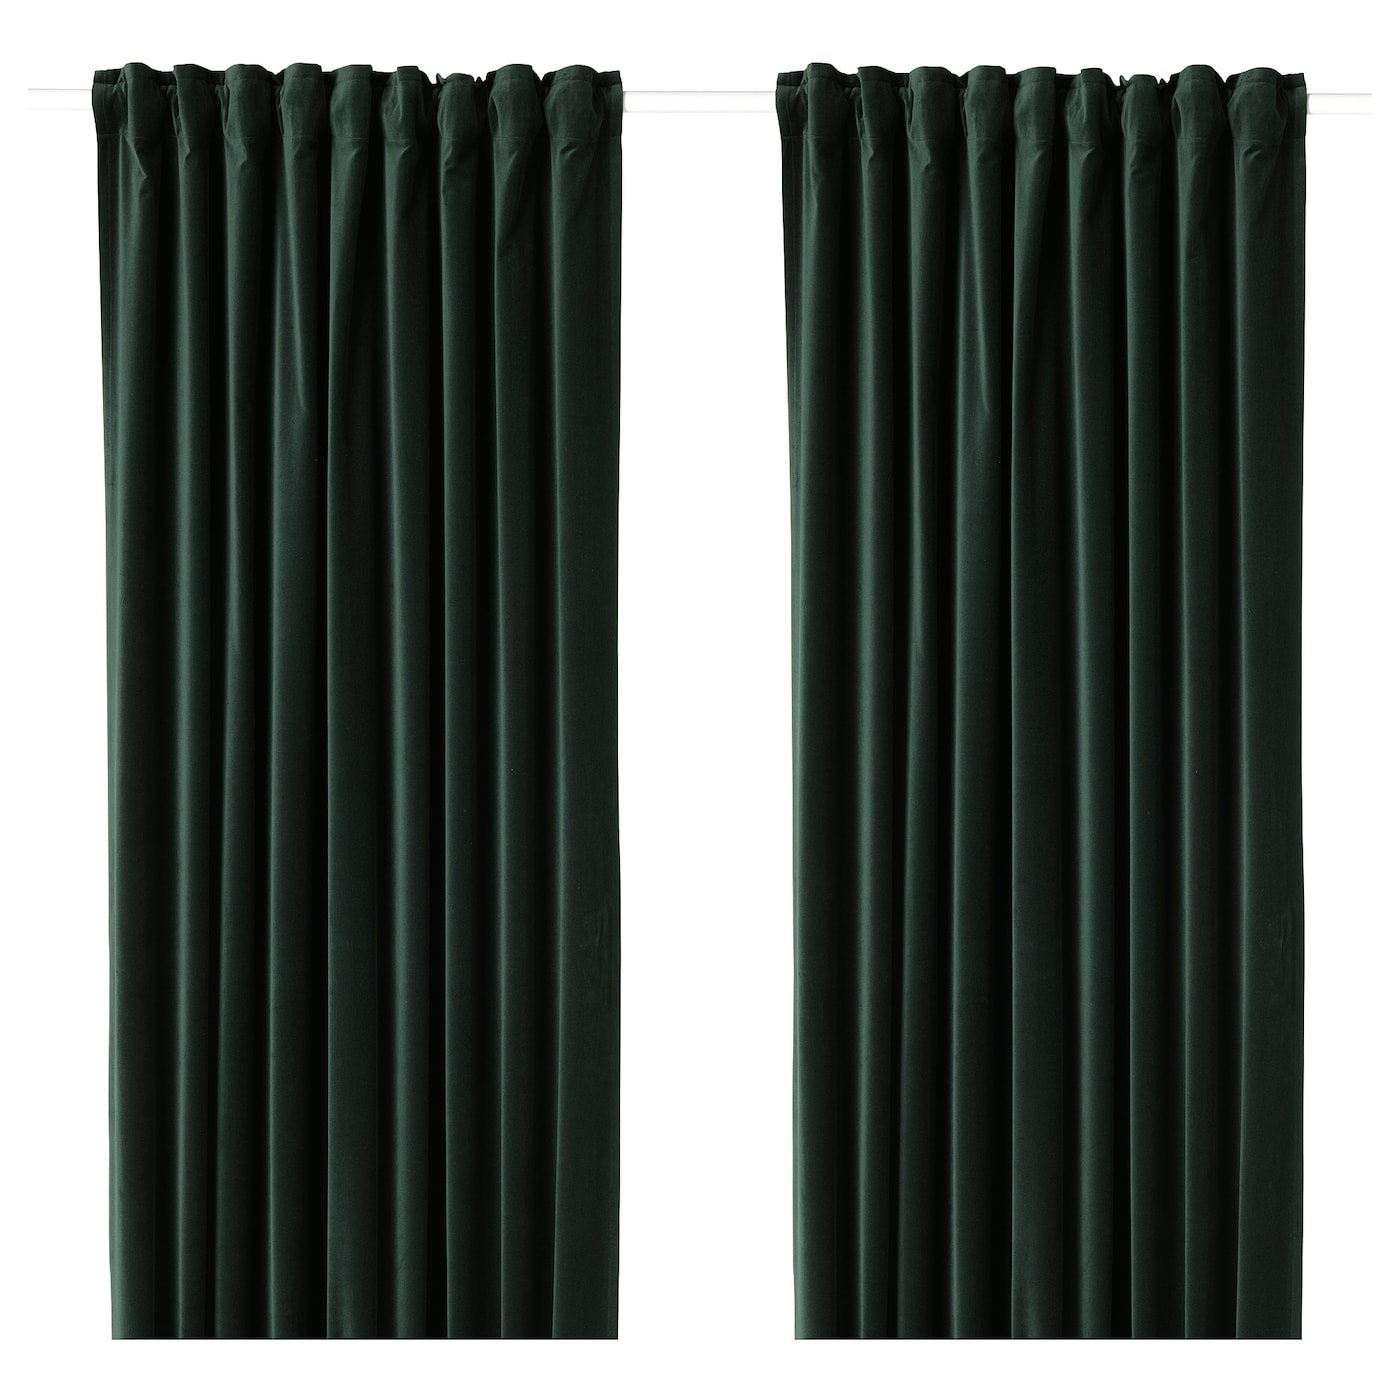 Shop SANELA Room darkening curtains from Ikea on Openhaus